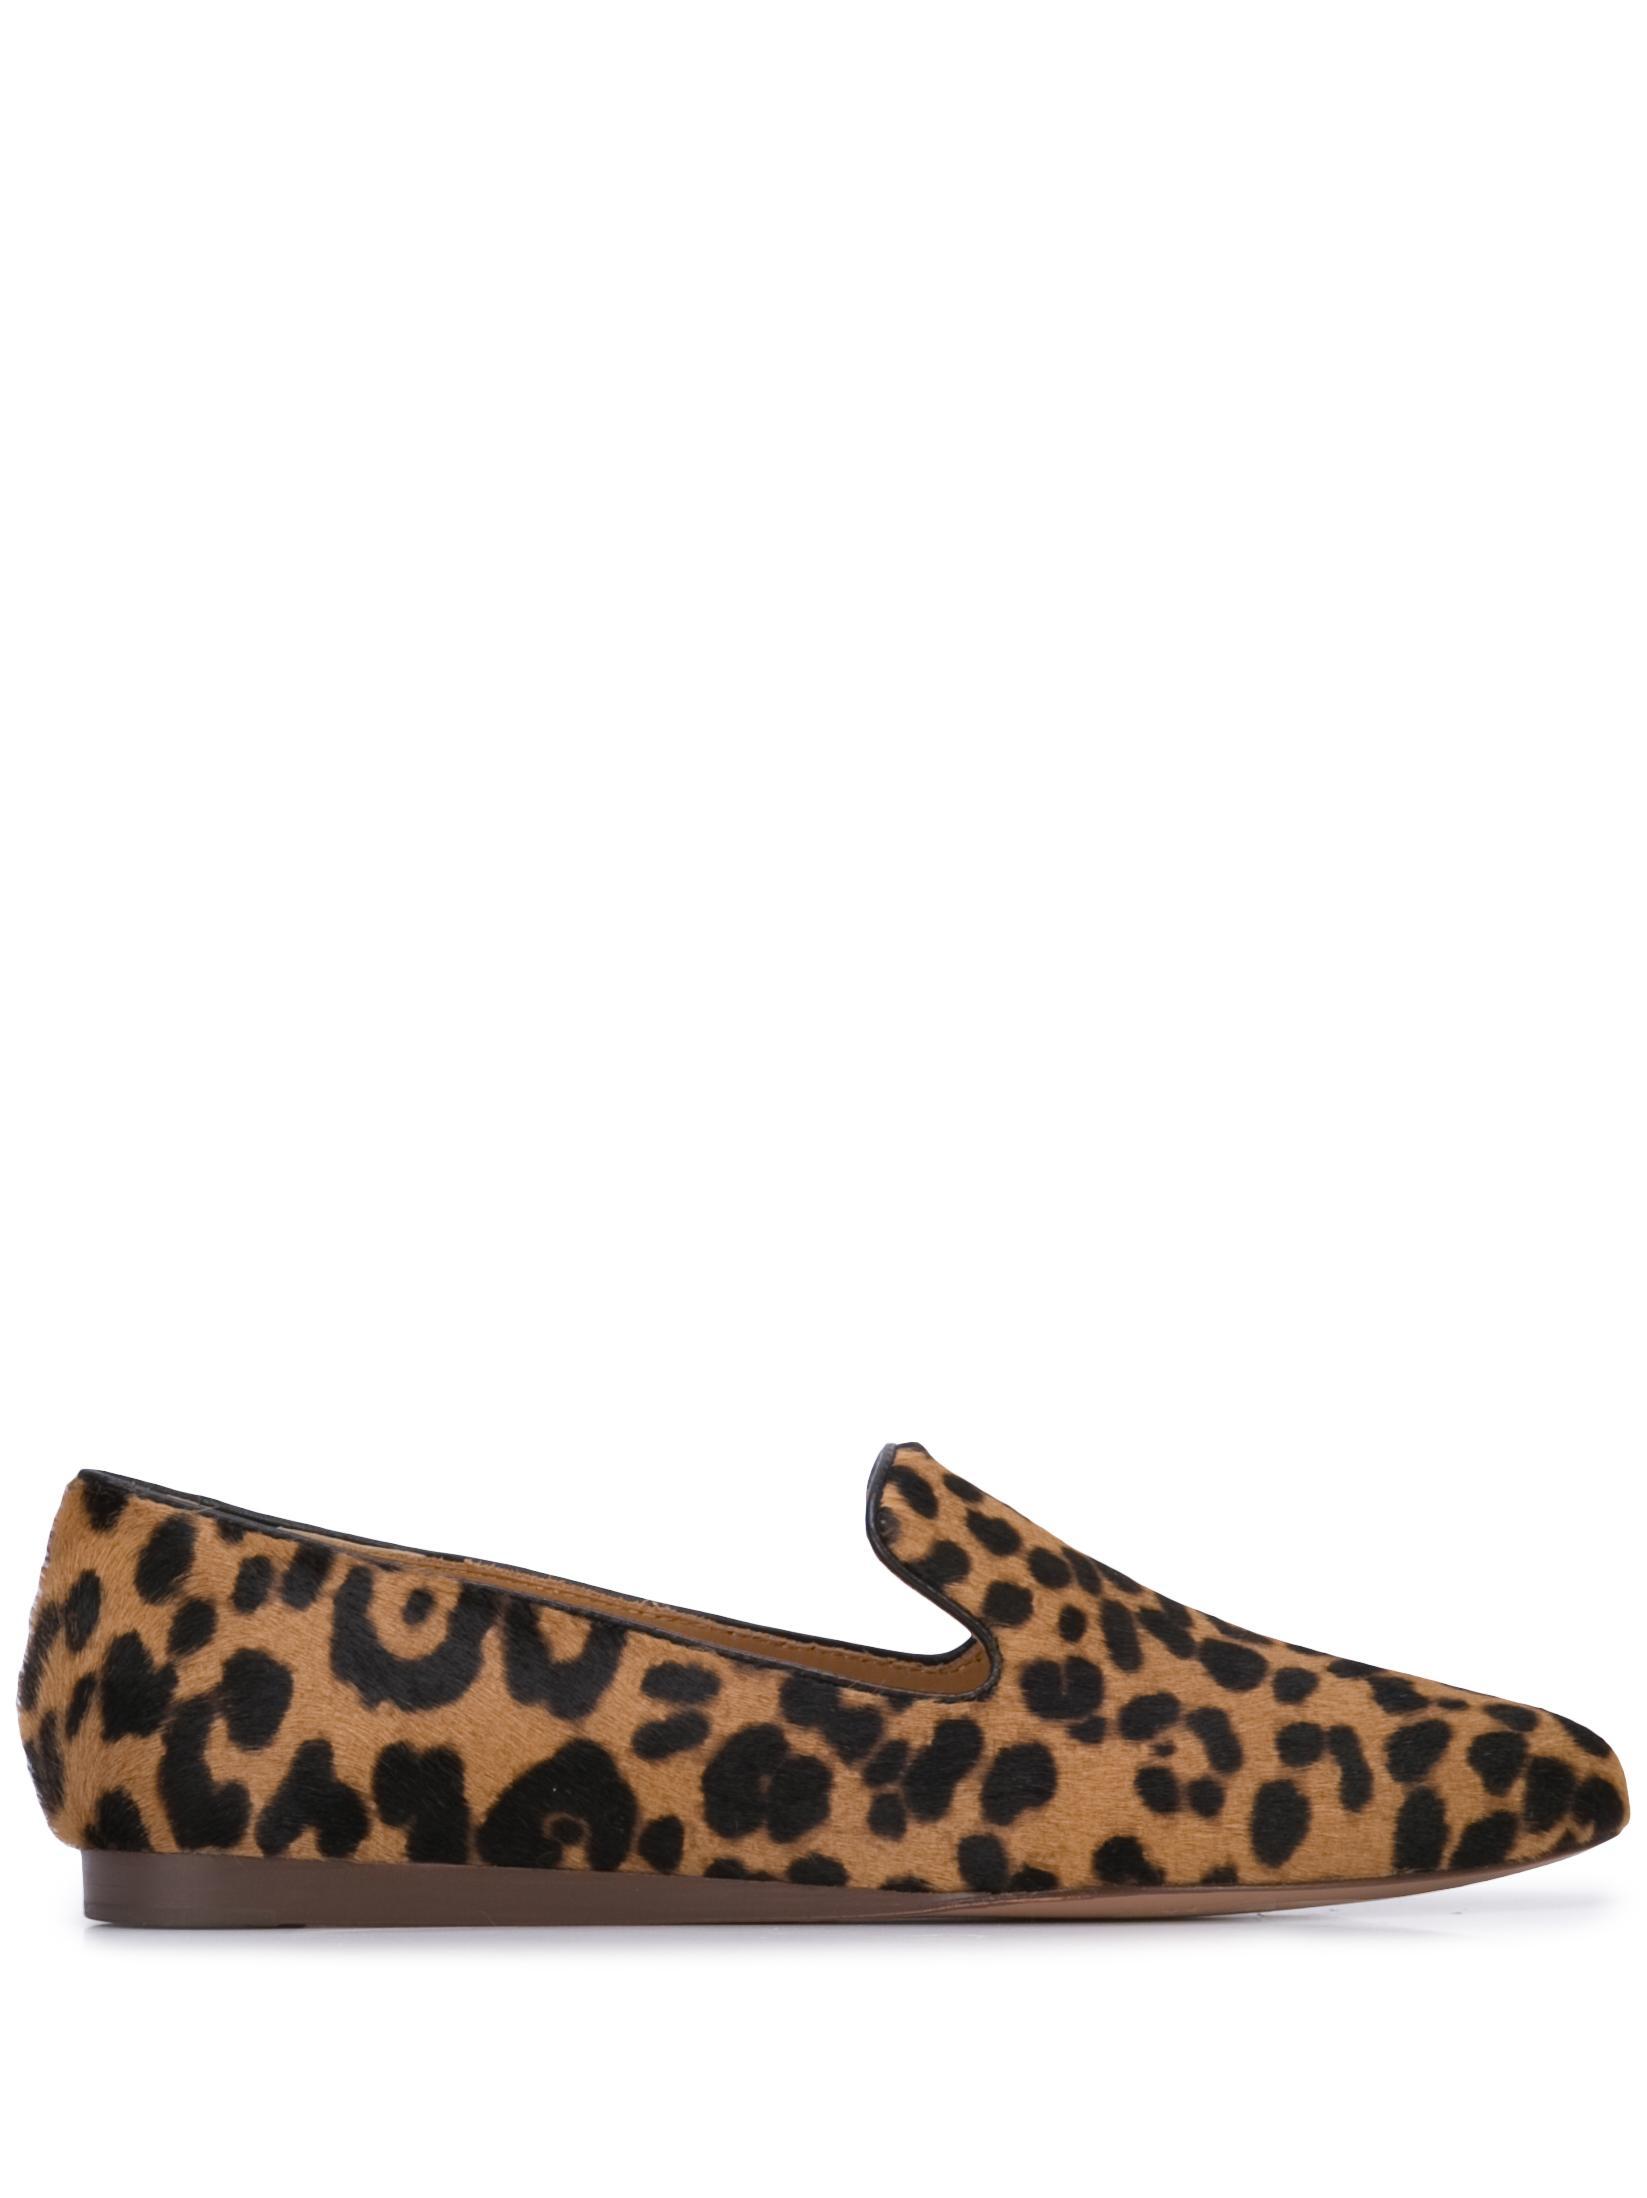 Griffin Leopard Calf Hair Flat Item # F190206HC